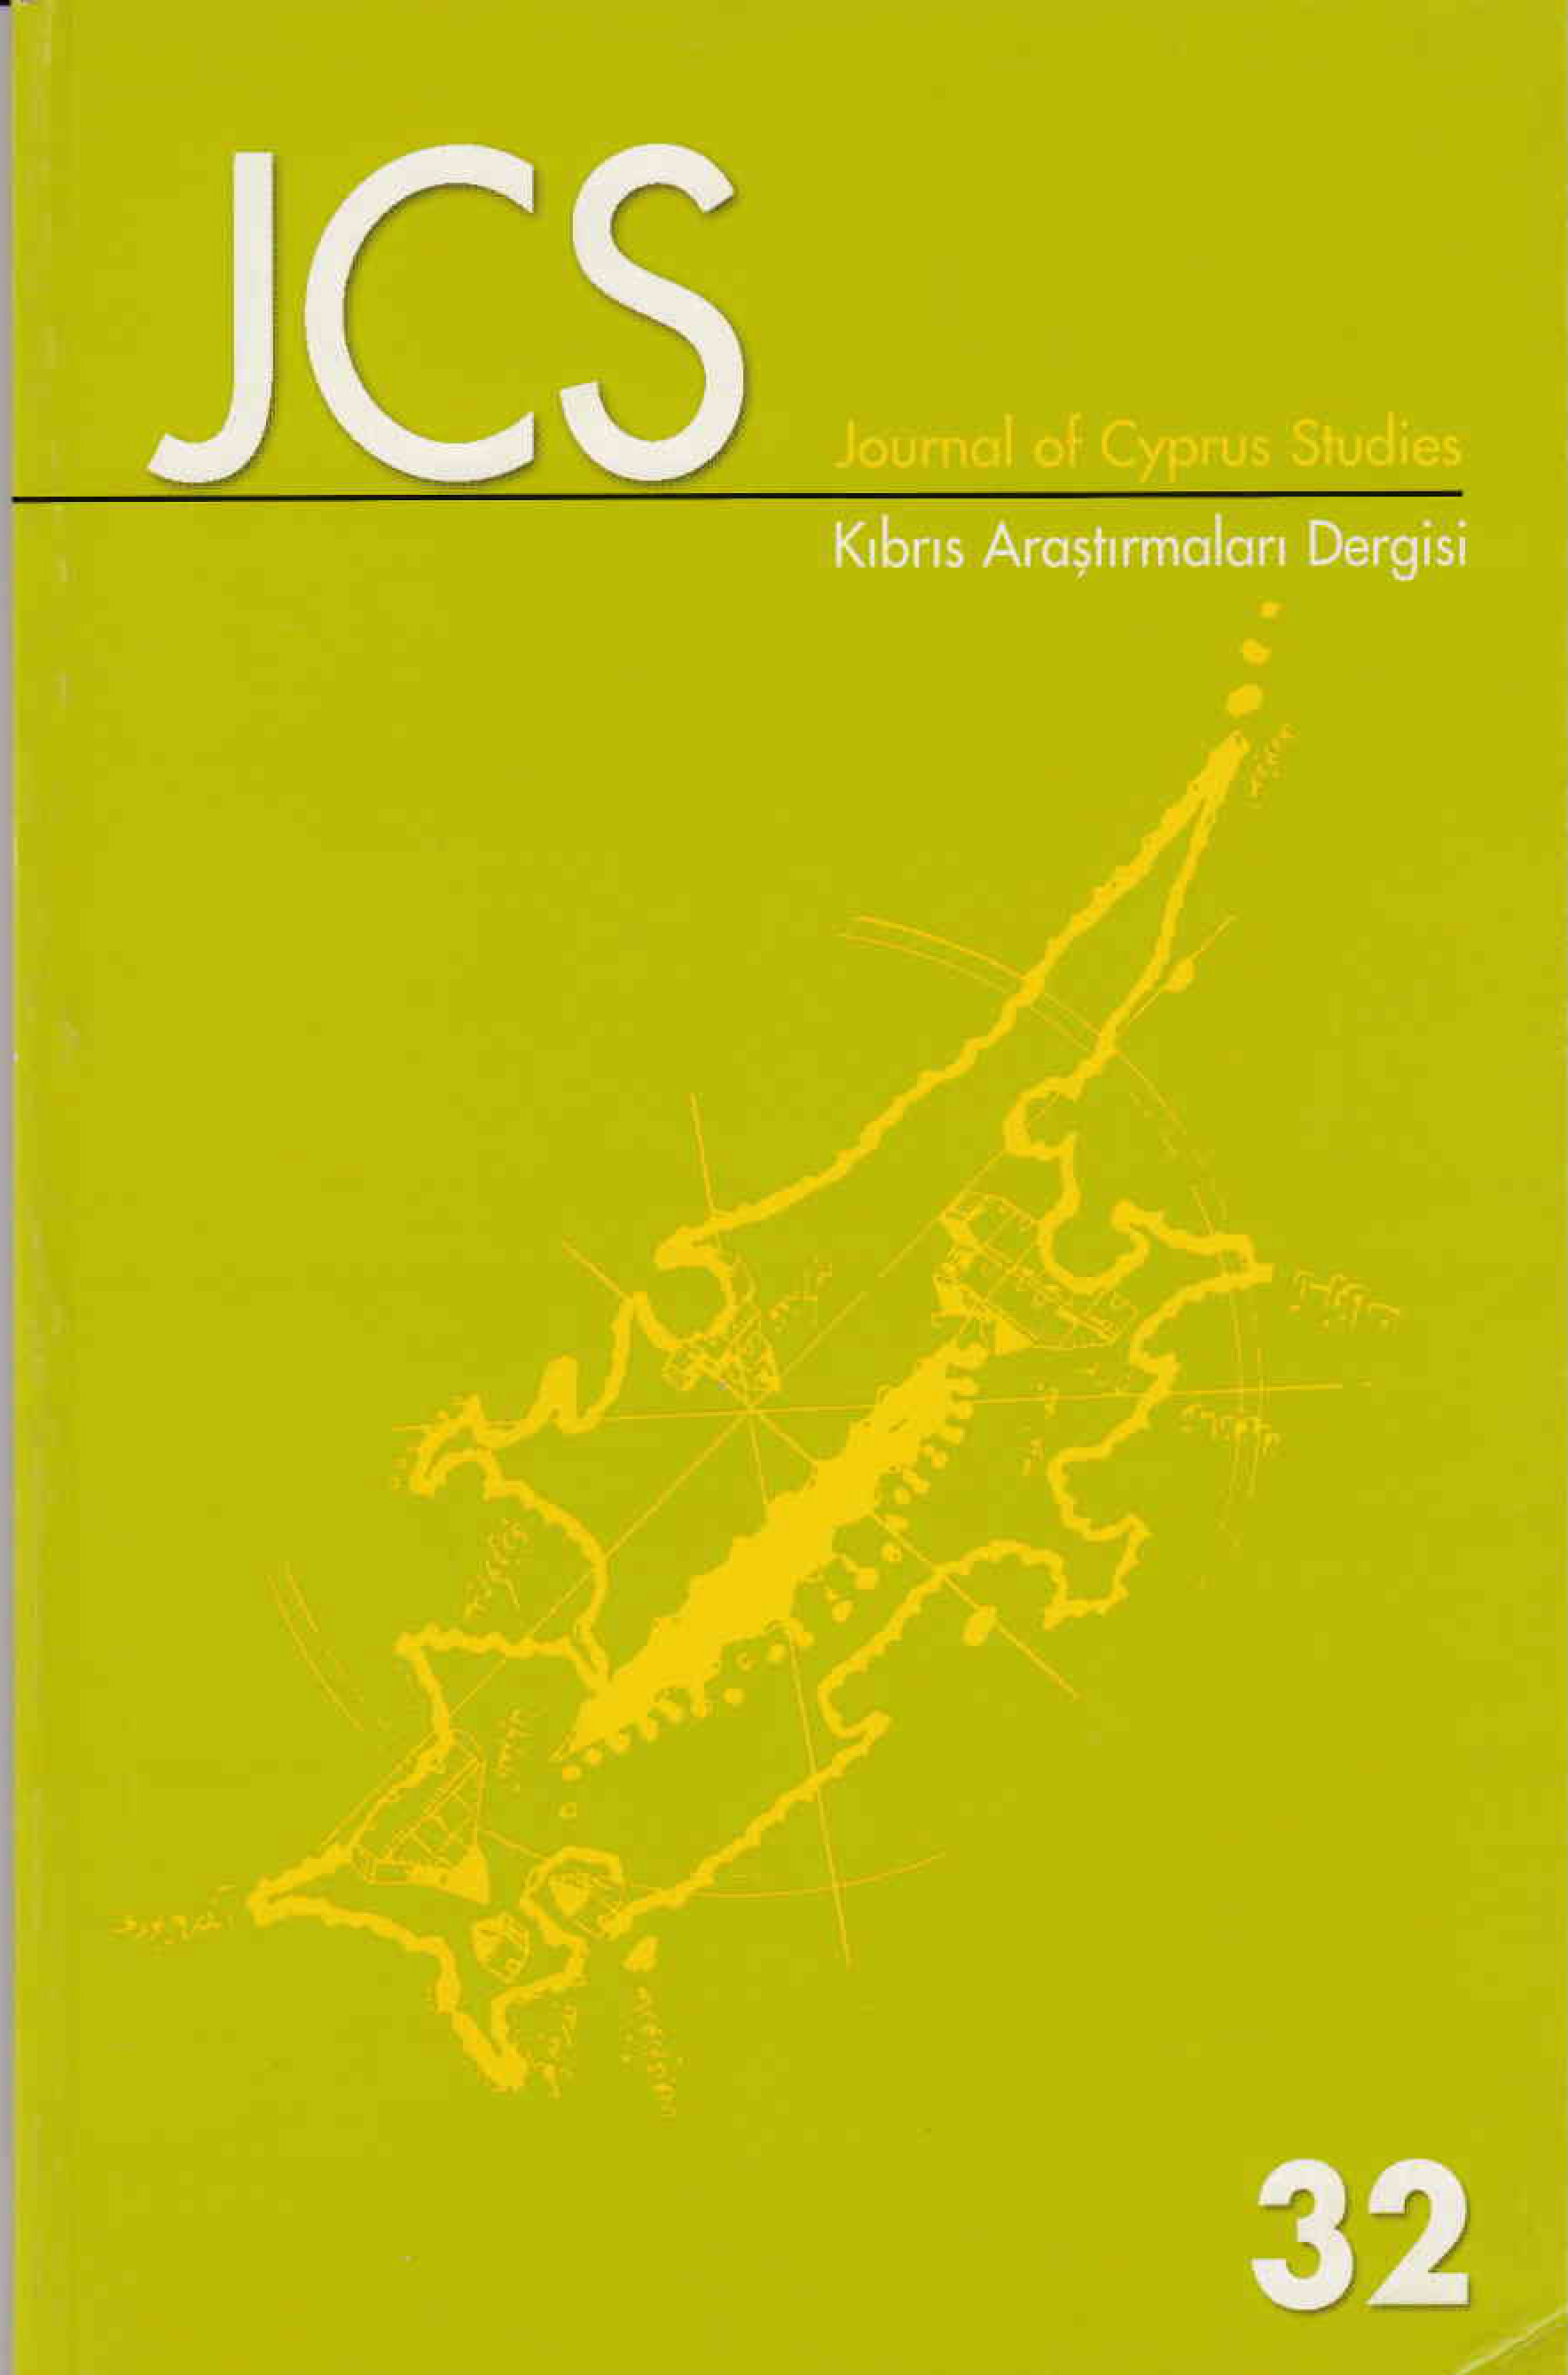 View Vol. 13 No. 32 (2007): Journal of Cyprus Studies